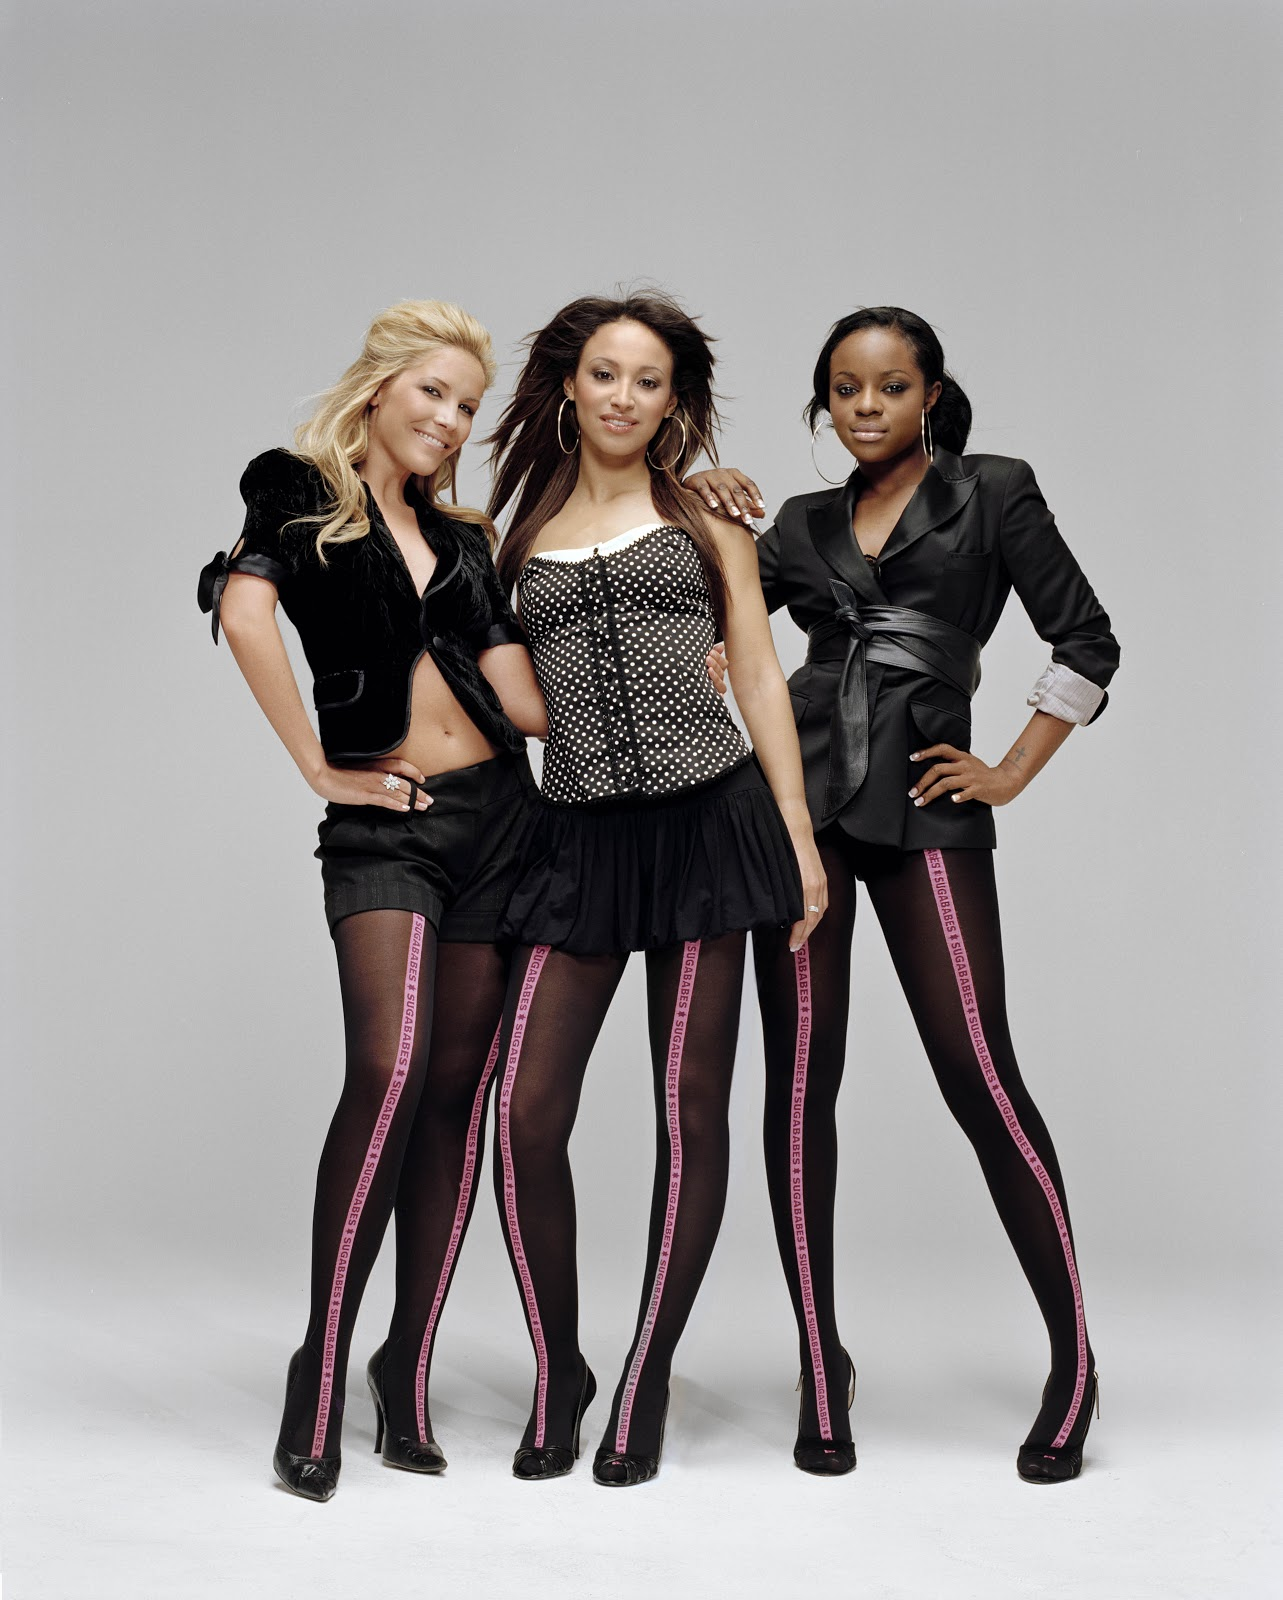 Sugababes Amelle: Keisha nearly ruined me